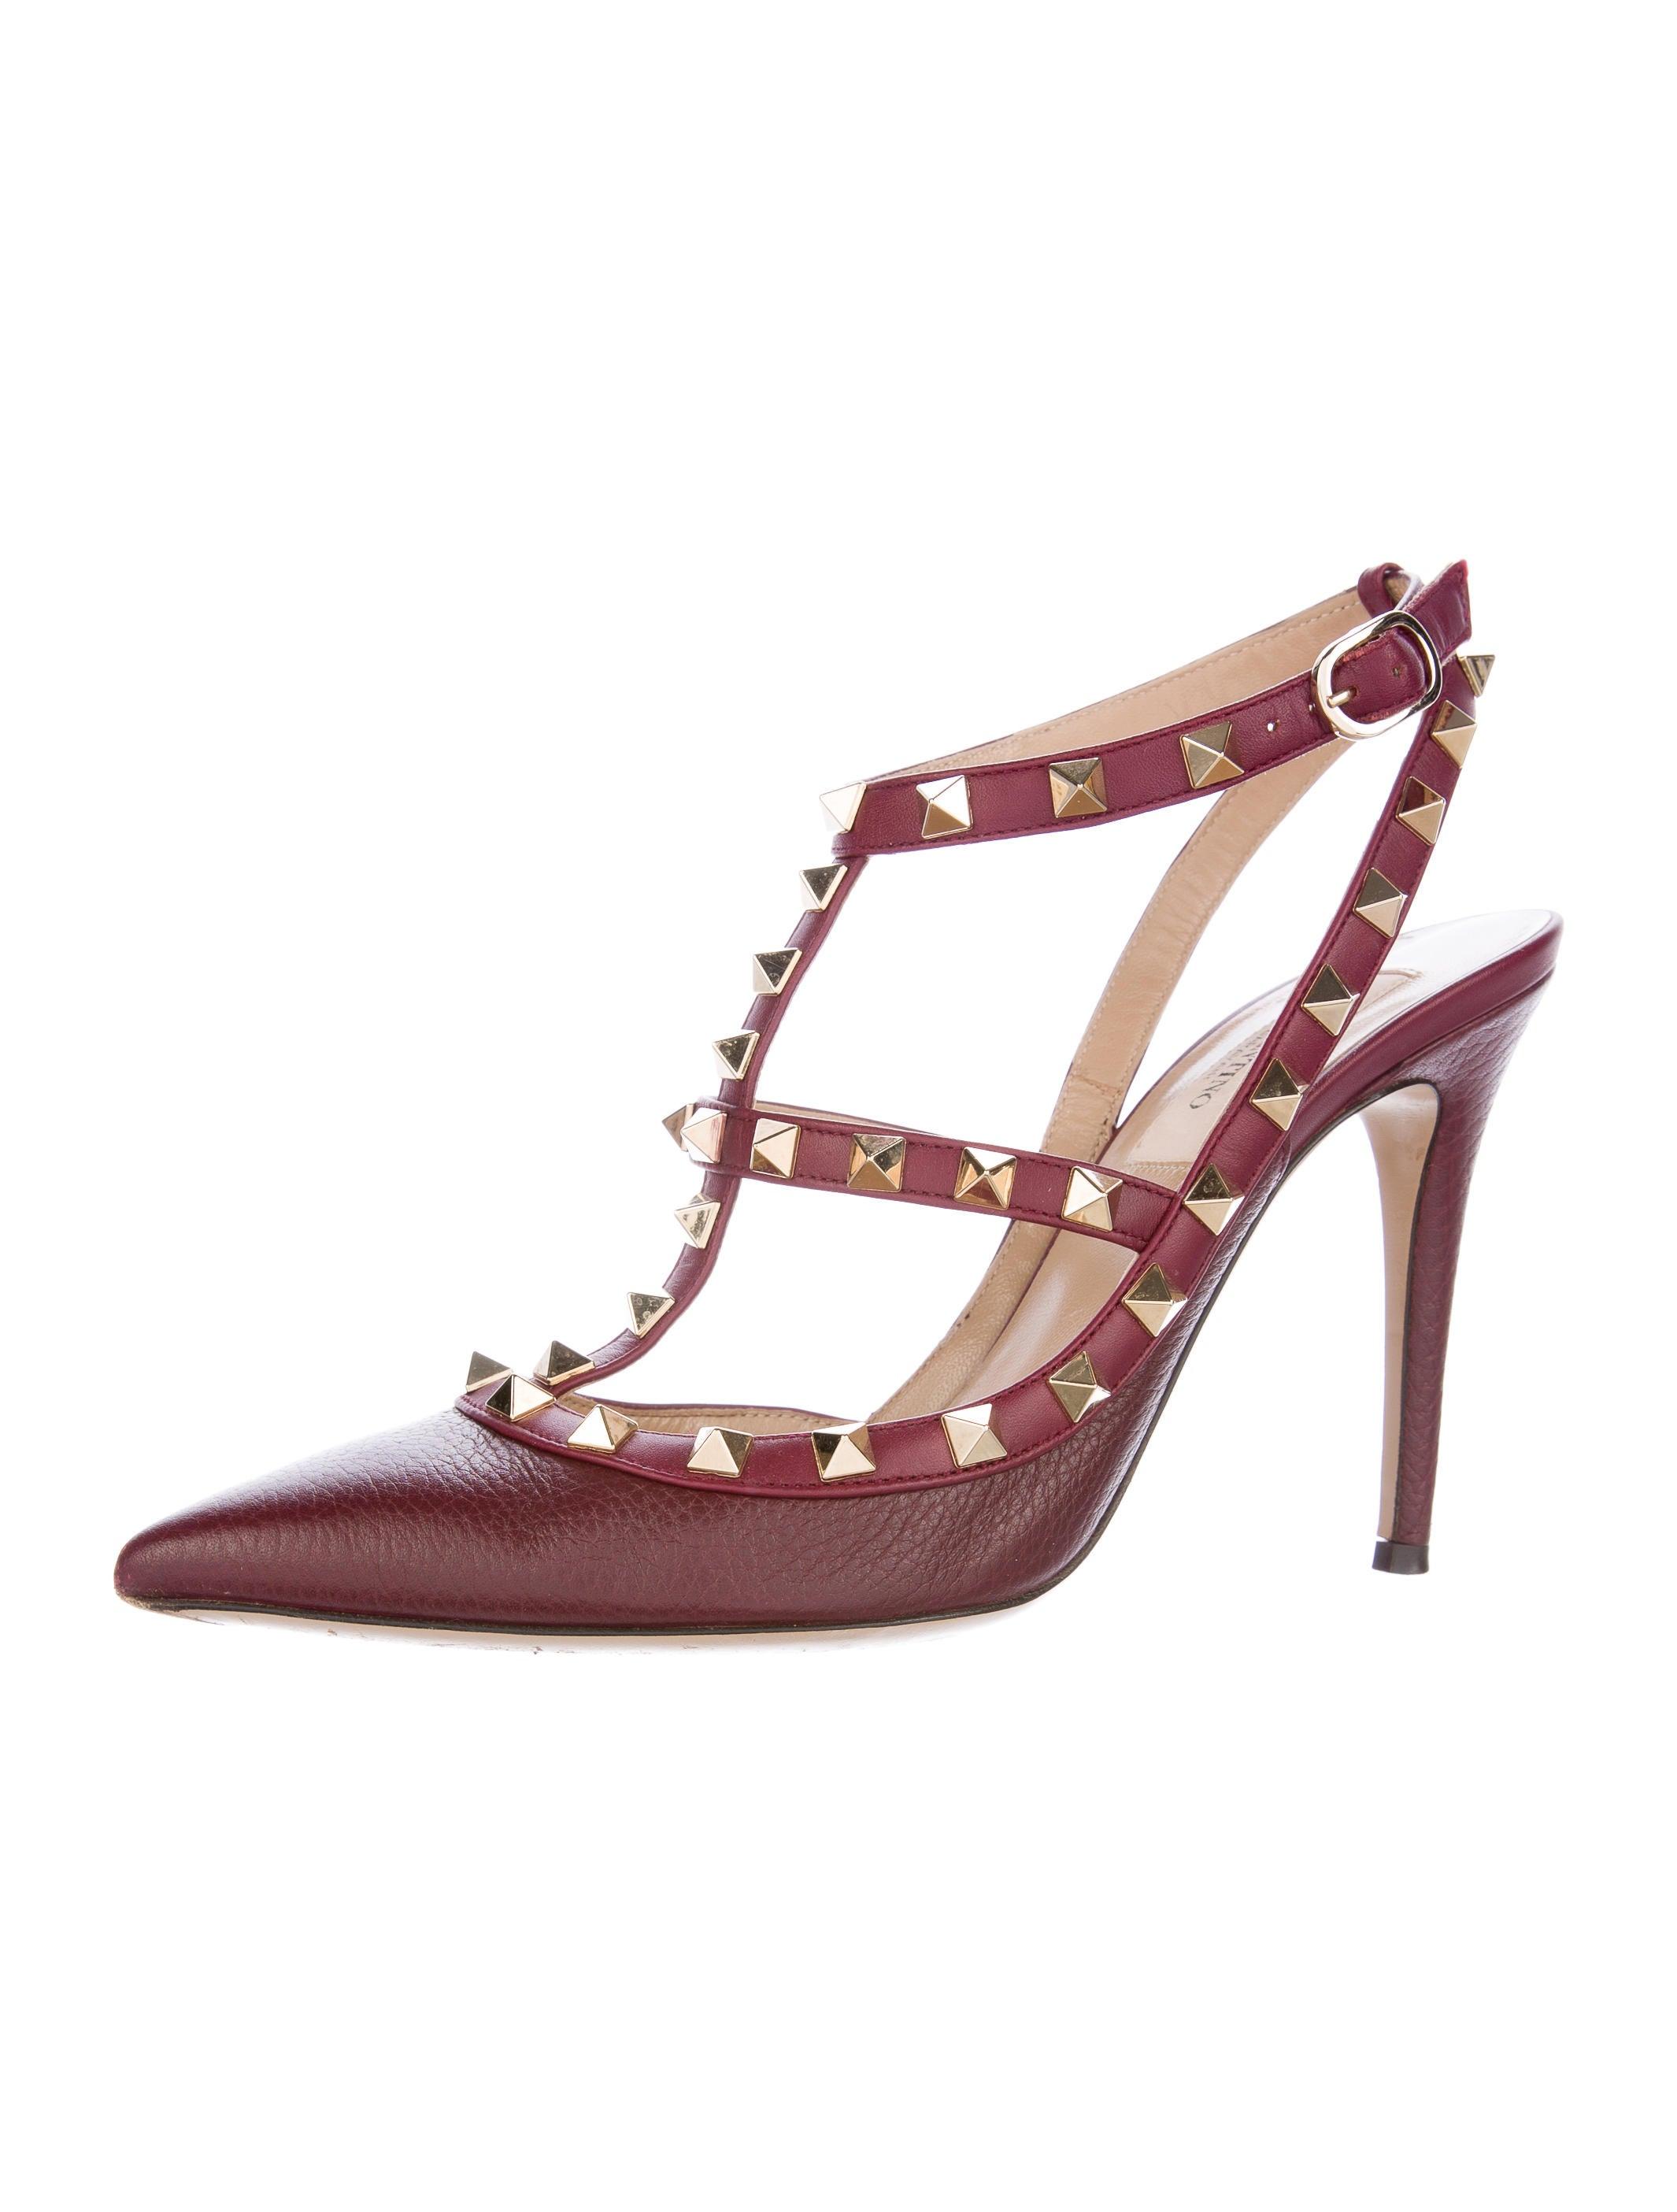 valentino rockstud pointed toe pumps shoes val64187. Black Bedroom Furniture Sets. Home Design Ideas